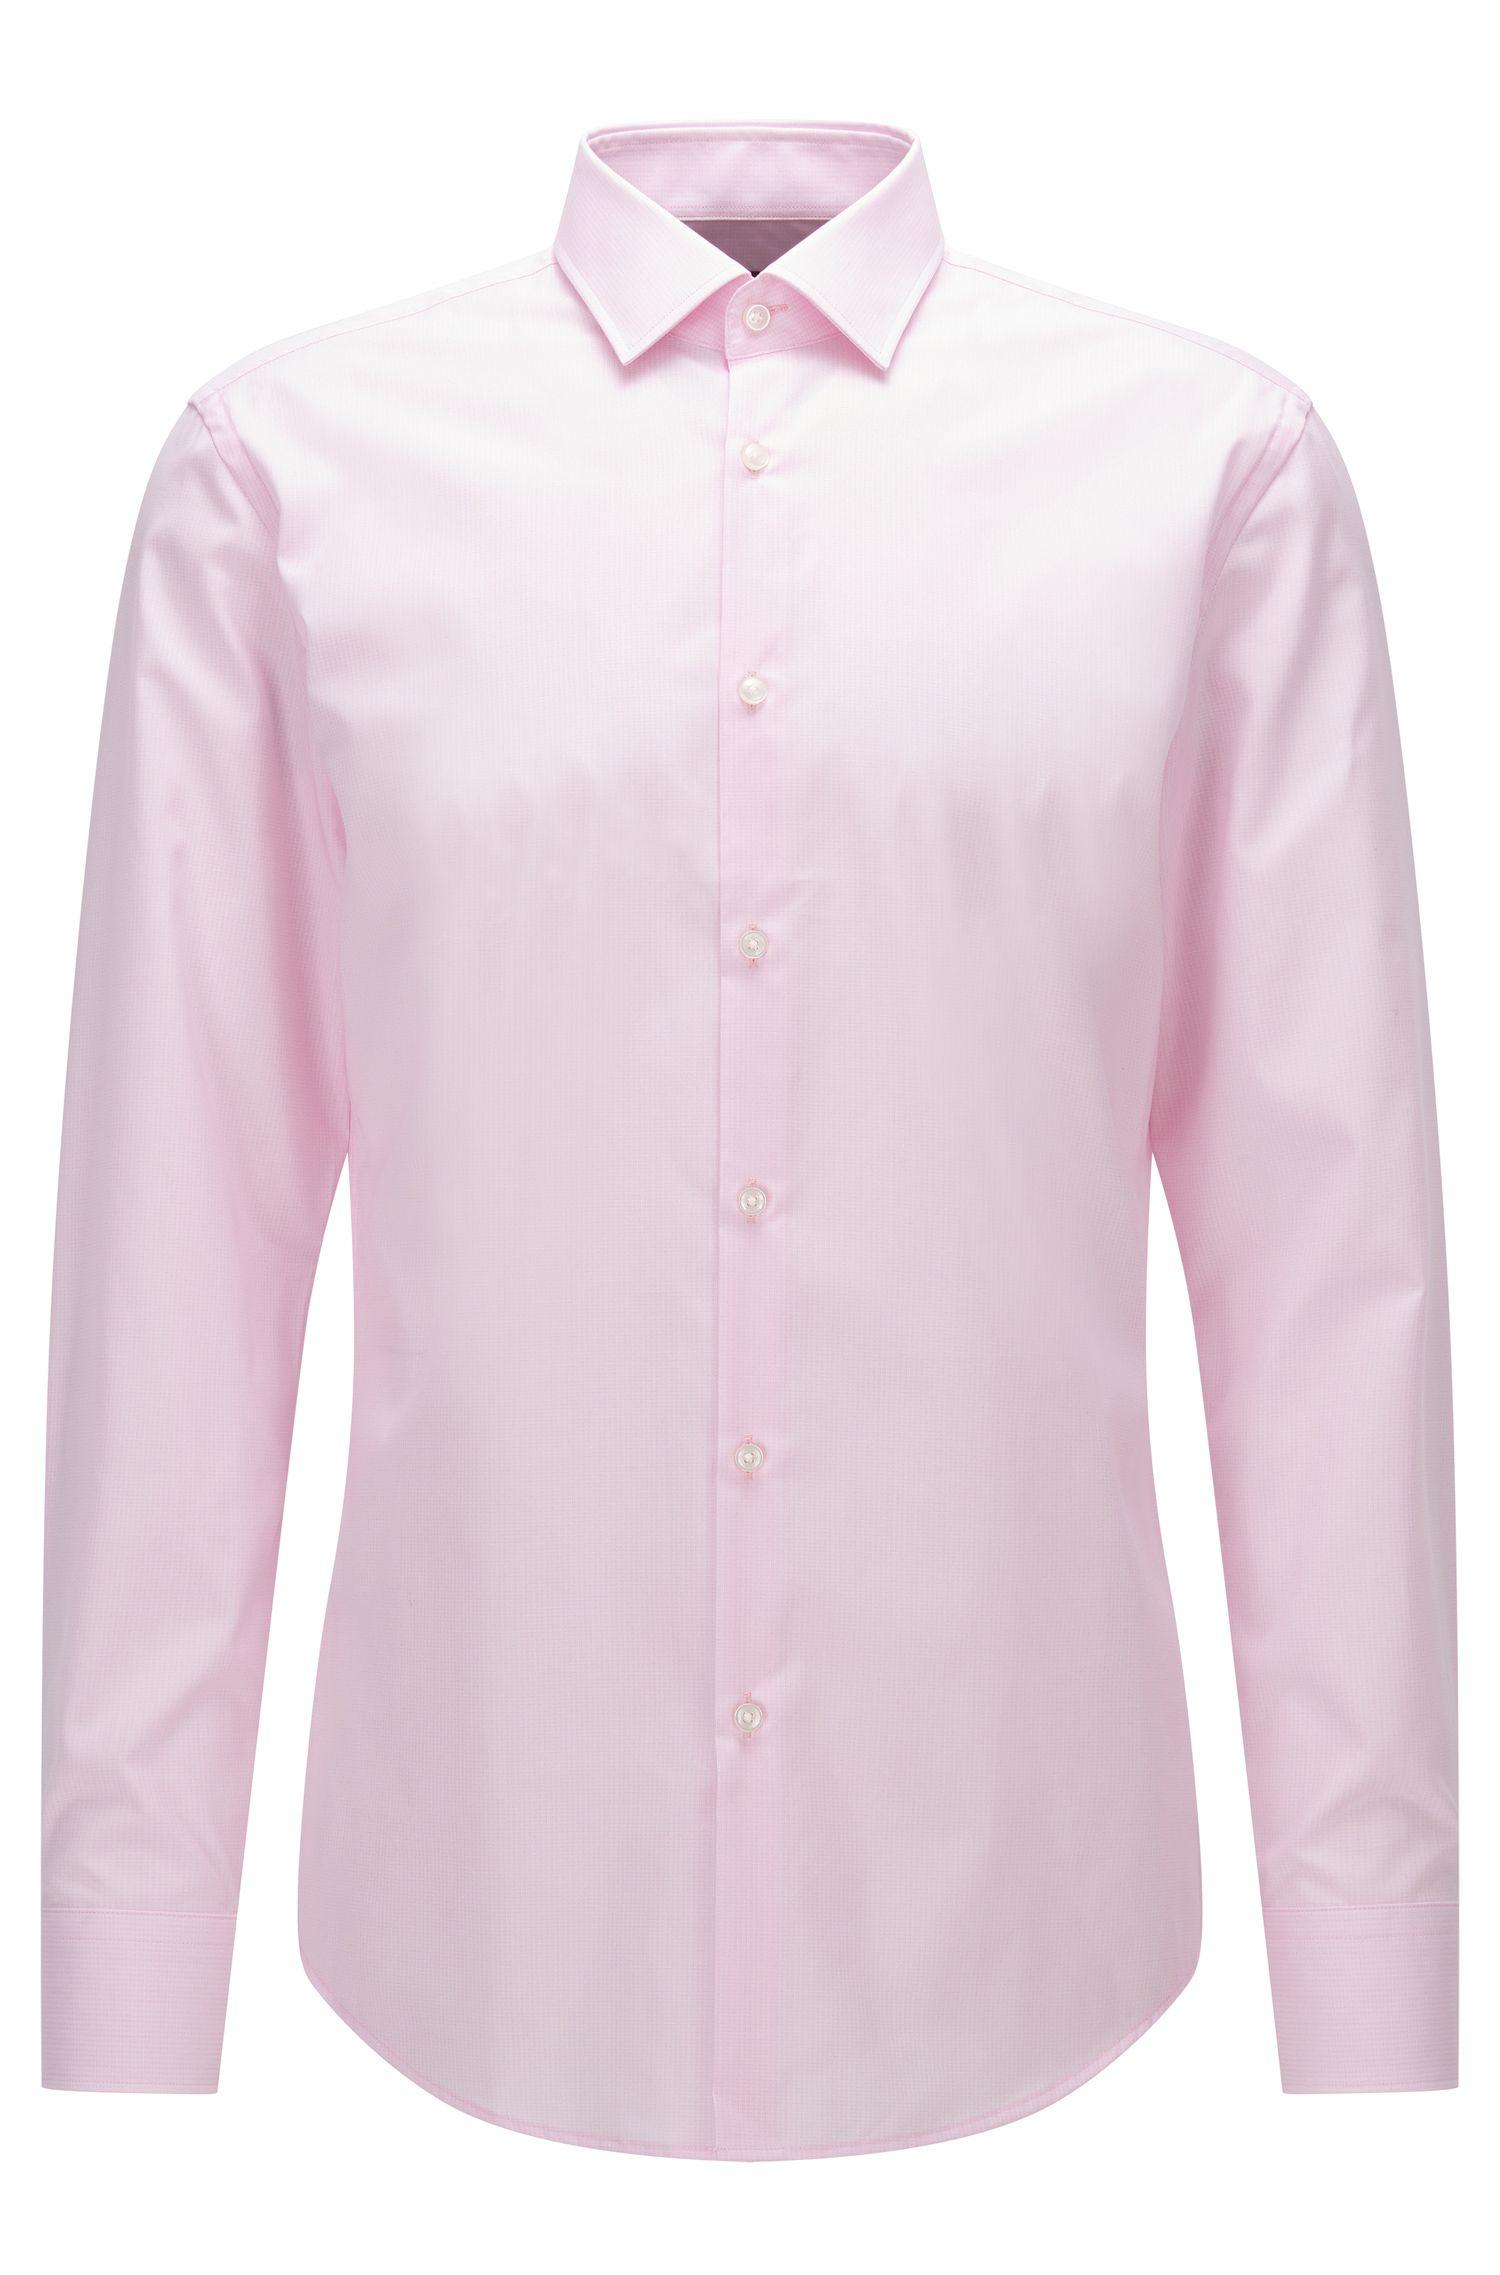 Slim-fit shirt in patterned cotton poplin